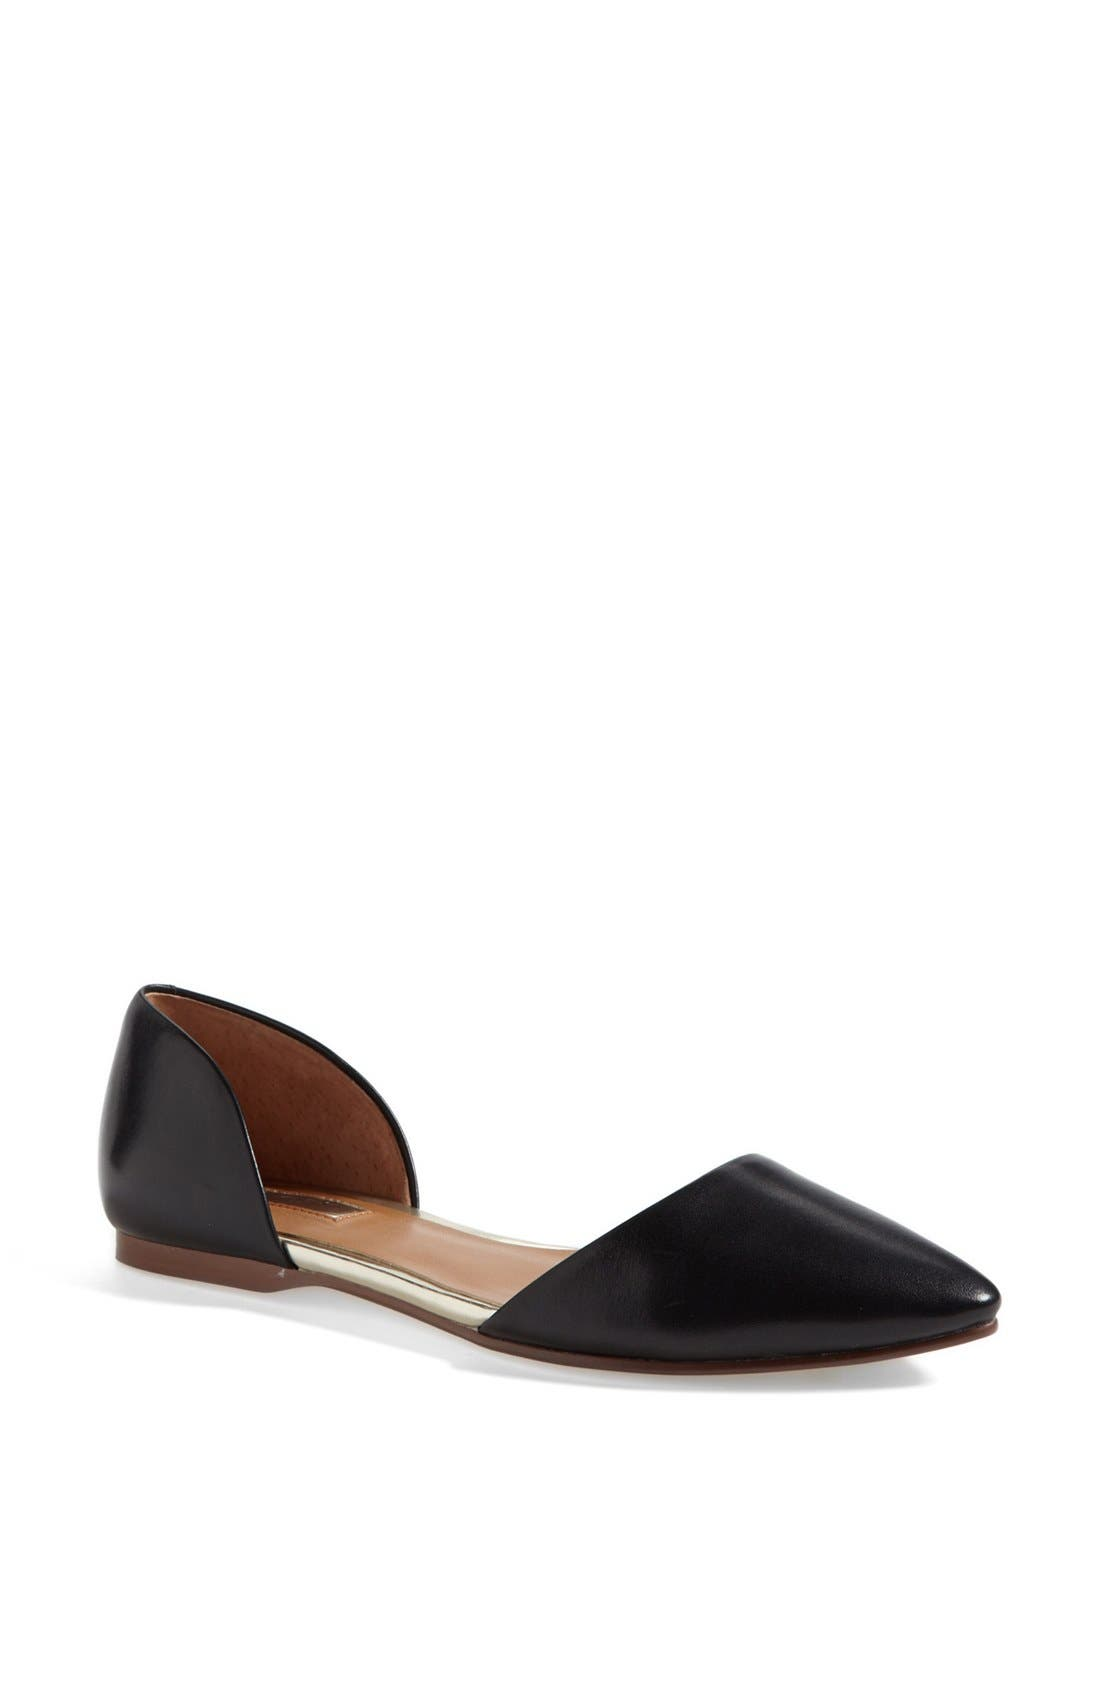 Alternate Image 1 Selected - Halogen® 'Kayla' Pointy Toe Flat